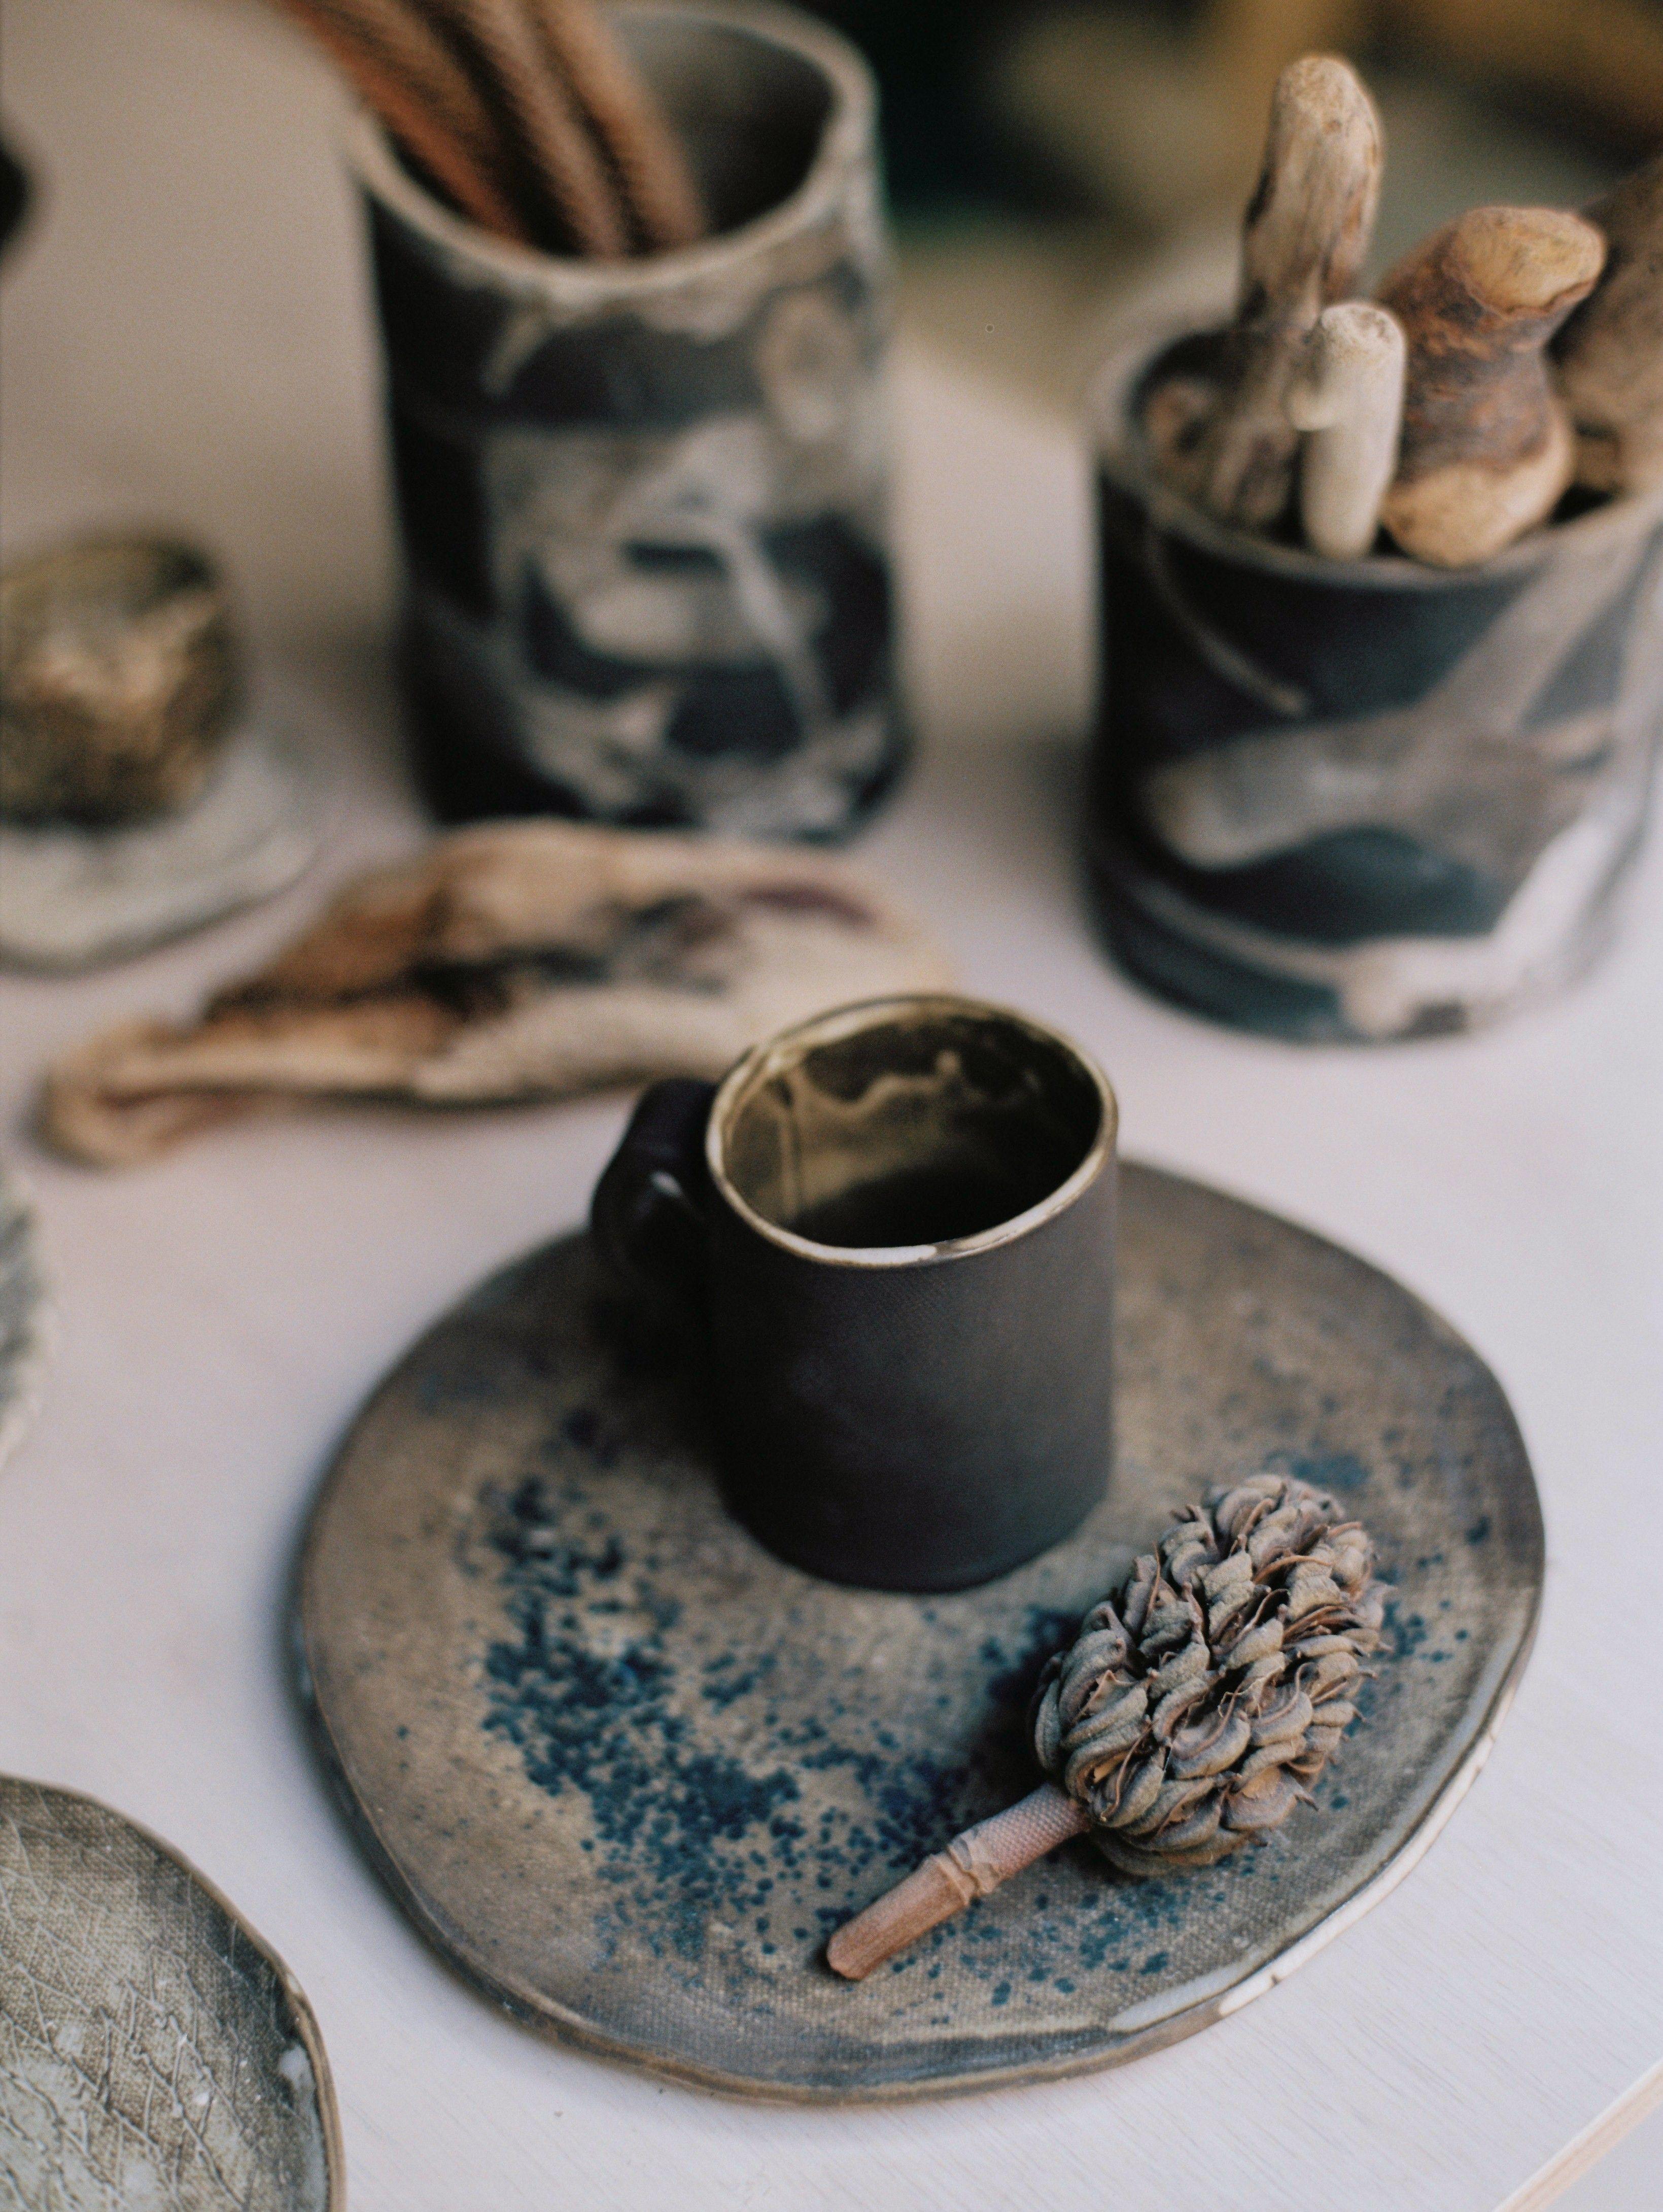 Rustic, handmade pieces by Julia Lu . .  #rusticstyle #wabisabi #handbuiltceramics #handmadepottery #breakfast #slowfood #slowliving #potterylove #handcrafted #rustichome #buysmall #clay #claystagram #ceramicbowl #rustictable #functionalart #hygge #thoughtfuldesign #minimalism #céramique #keramik #inapiredbynature #ceramica #inspiredbynature #potterylove #onmytable #home #studiowork #designforfood #julia_lu_studio